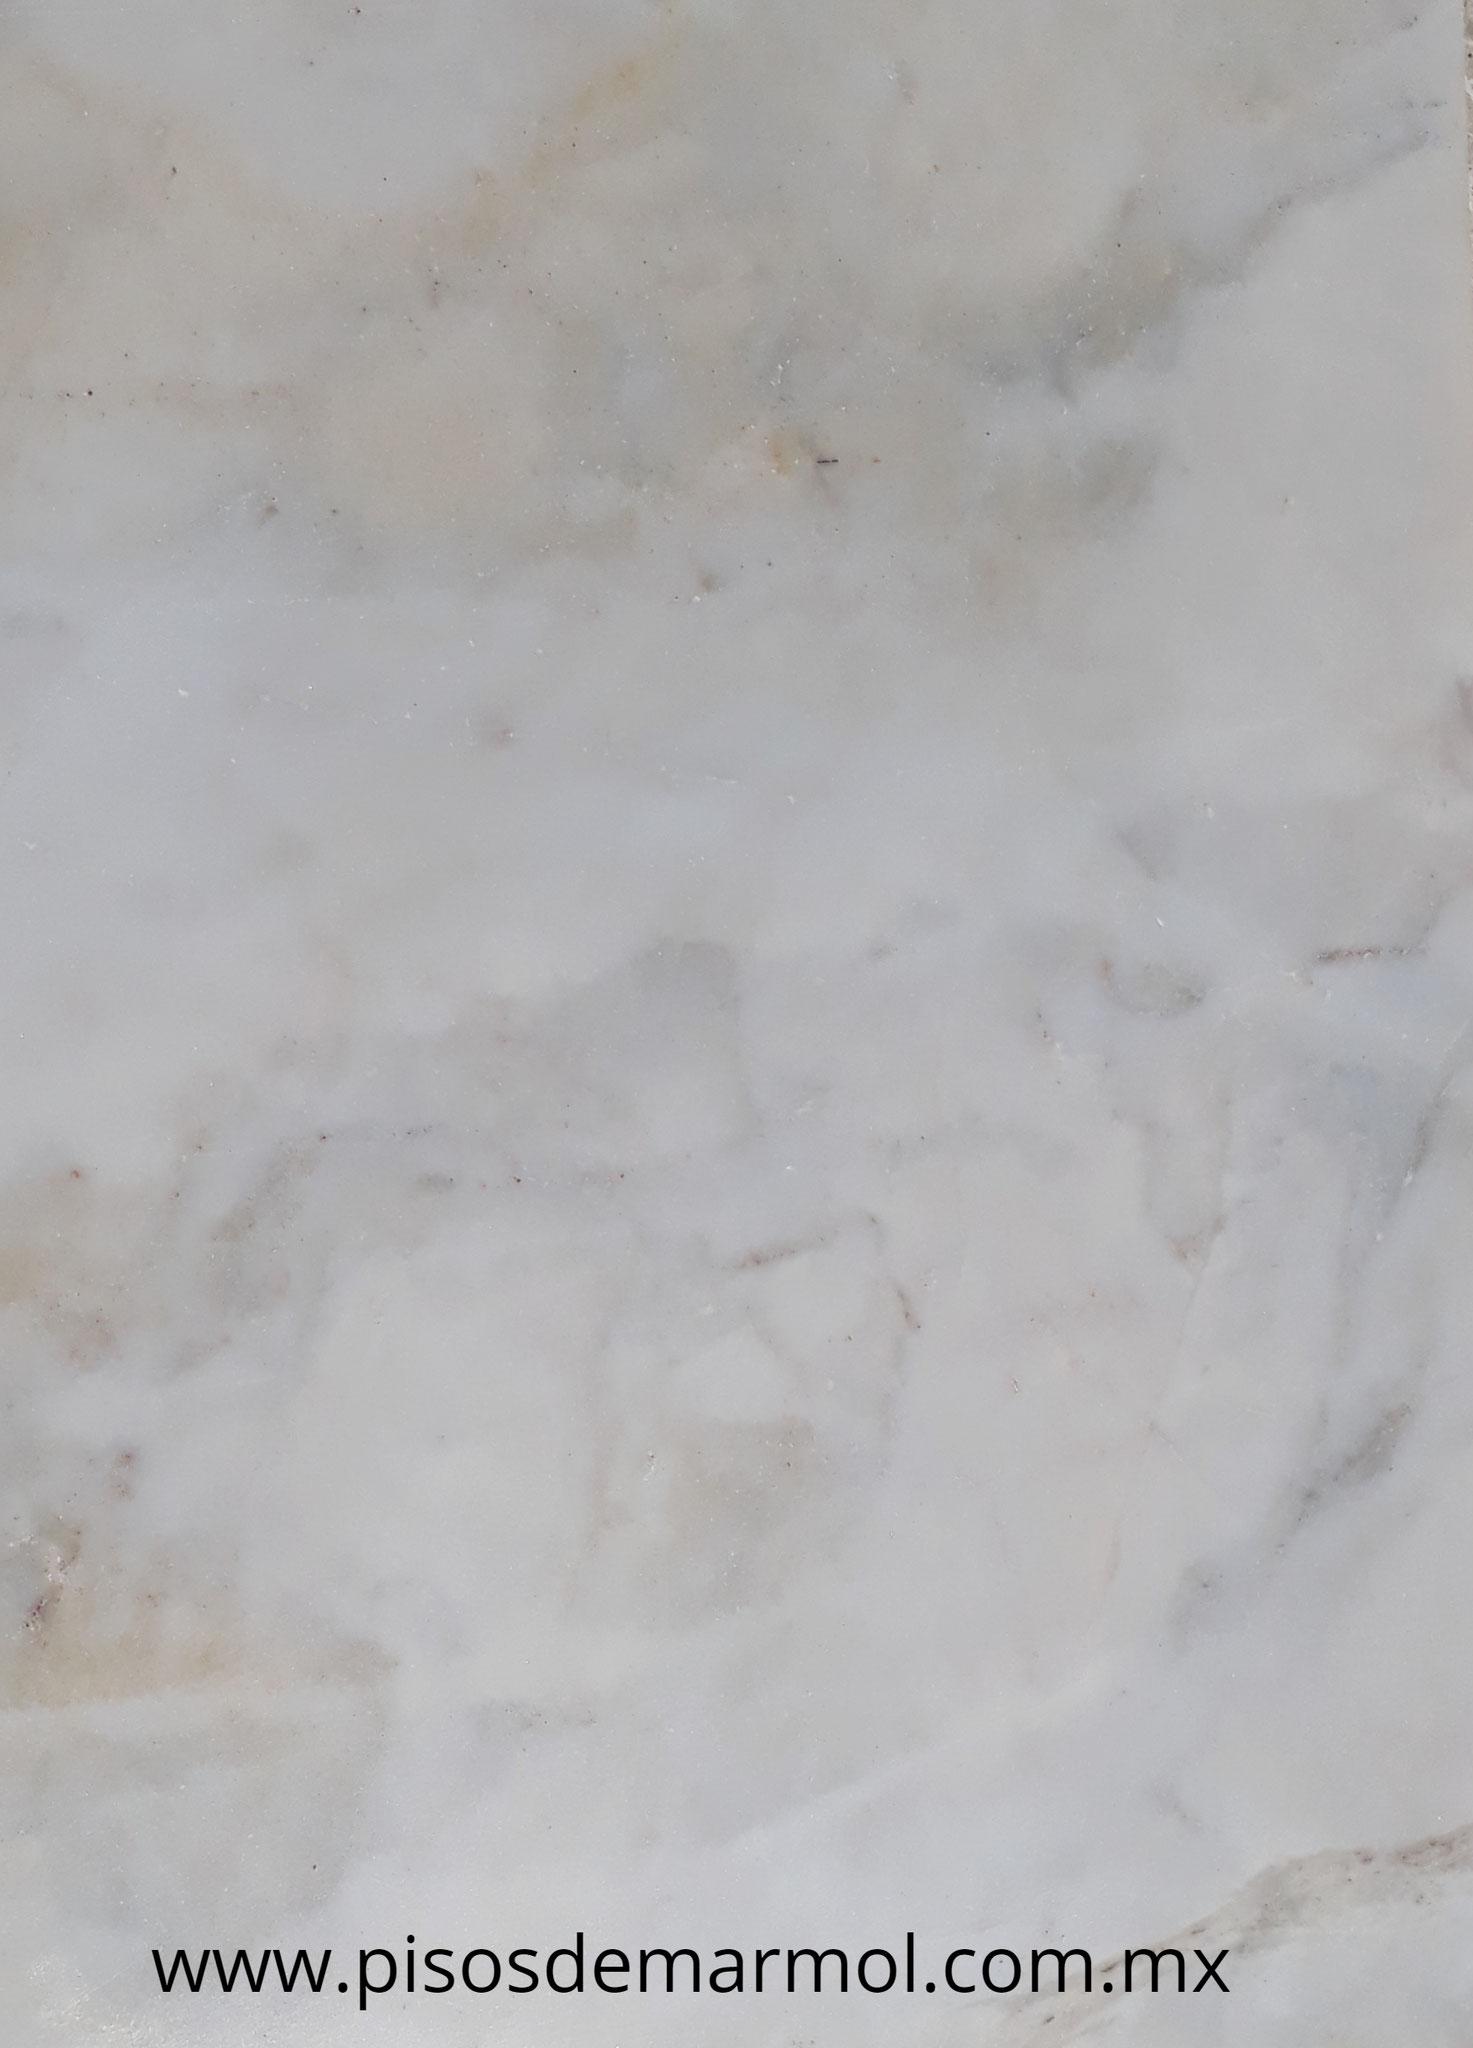 white marble, white carrara marble, carrara white, white calacatta marble, calacatta white marble, white royal marble, white carrara marble slab, carrara marble countertop, white carrara marble tile, marmol blanco, marmol blanco carrara, placas de marmol